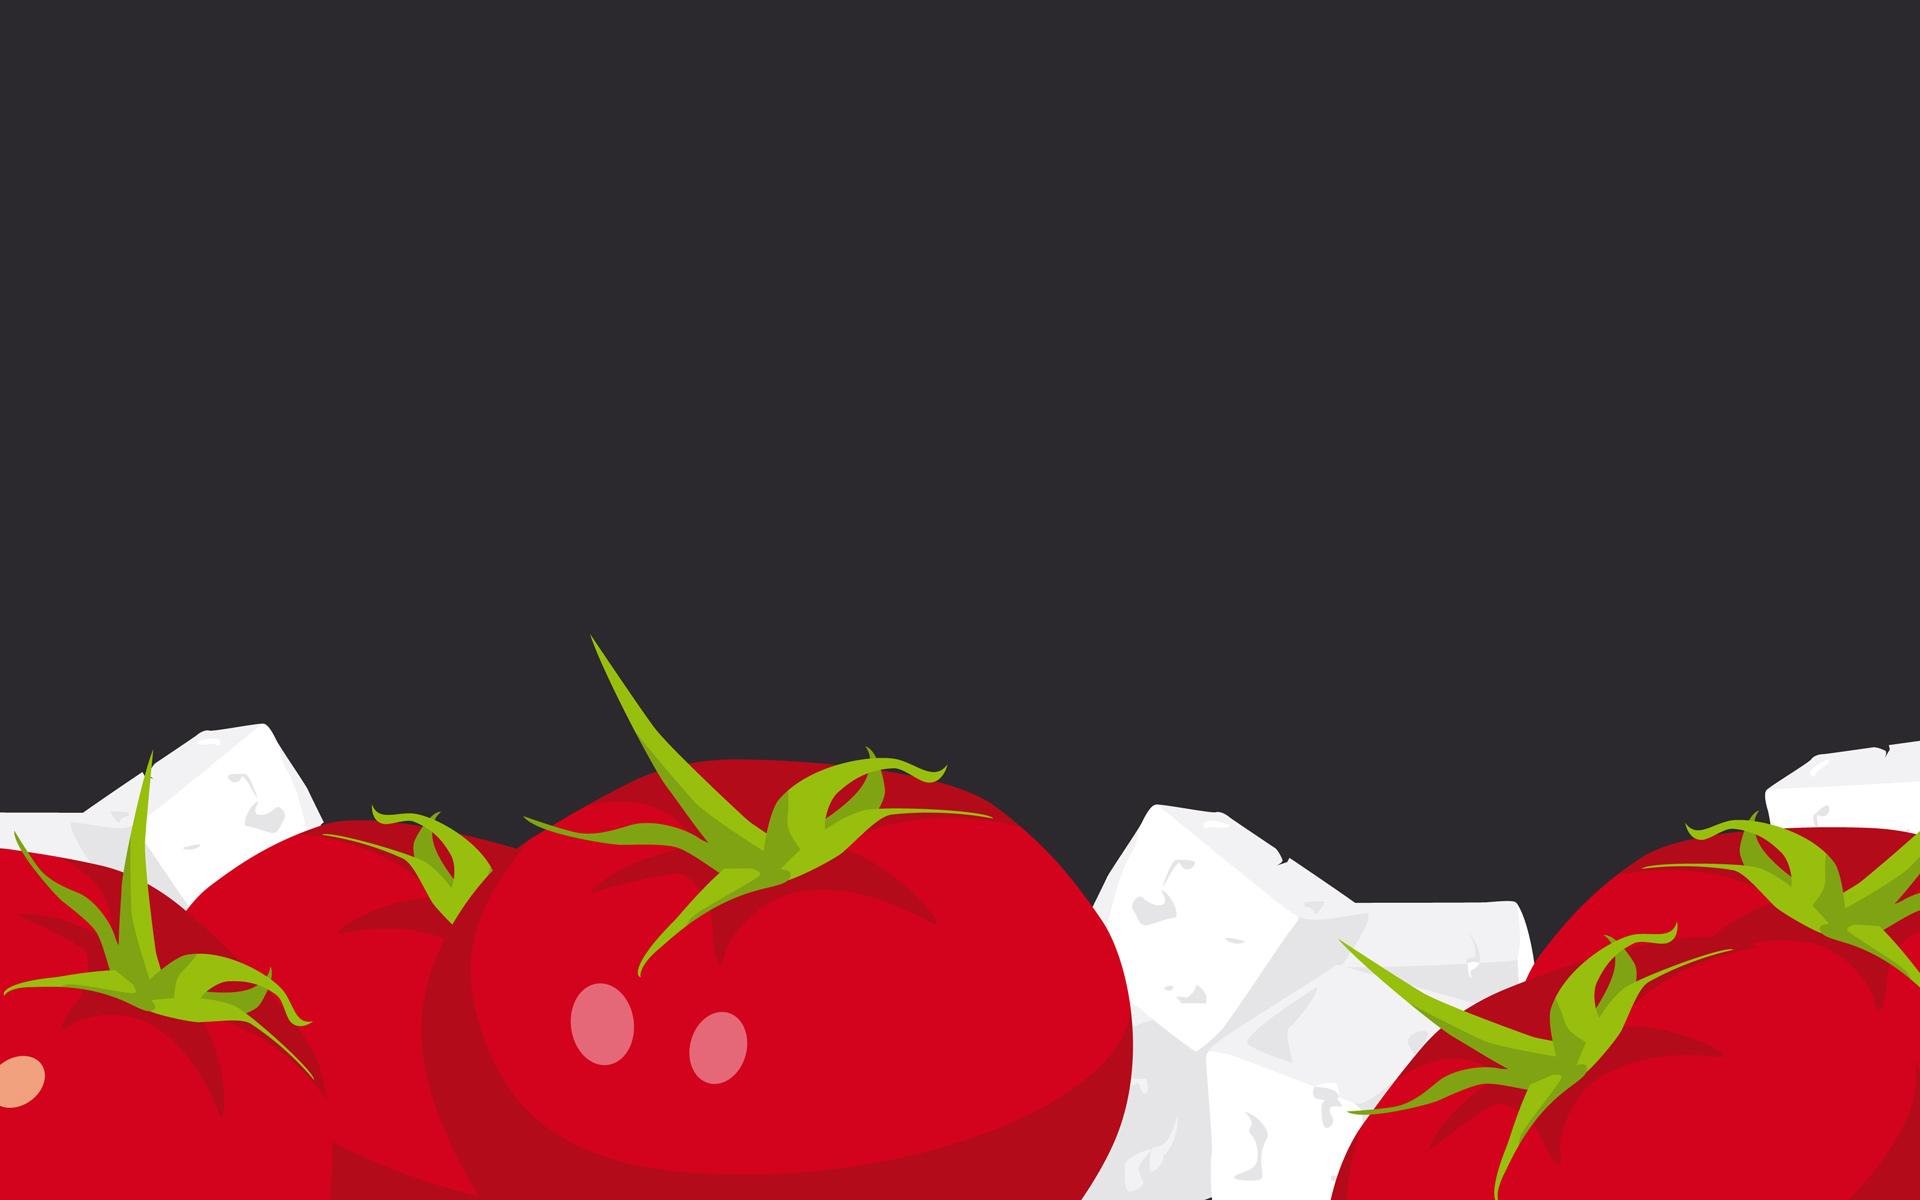 youcook Brand Identity, Illustration, Pasta alla Valentina